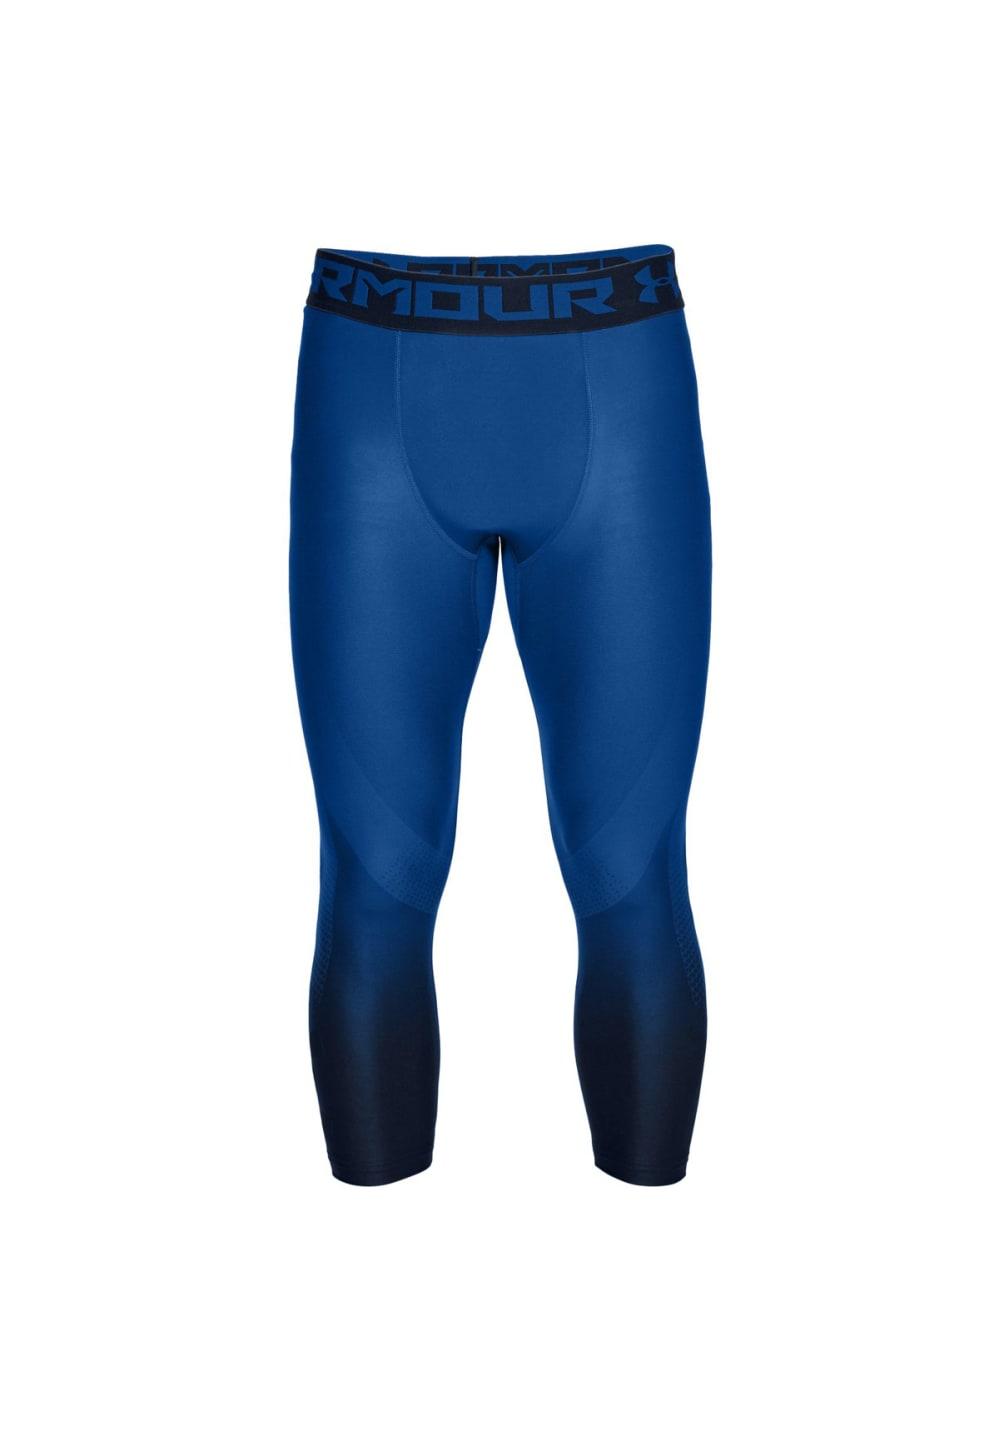 bd364949 Under Armour Heatgear Armour 2.0 3/4 Legging - Fitness trousers for Men -  Blue